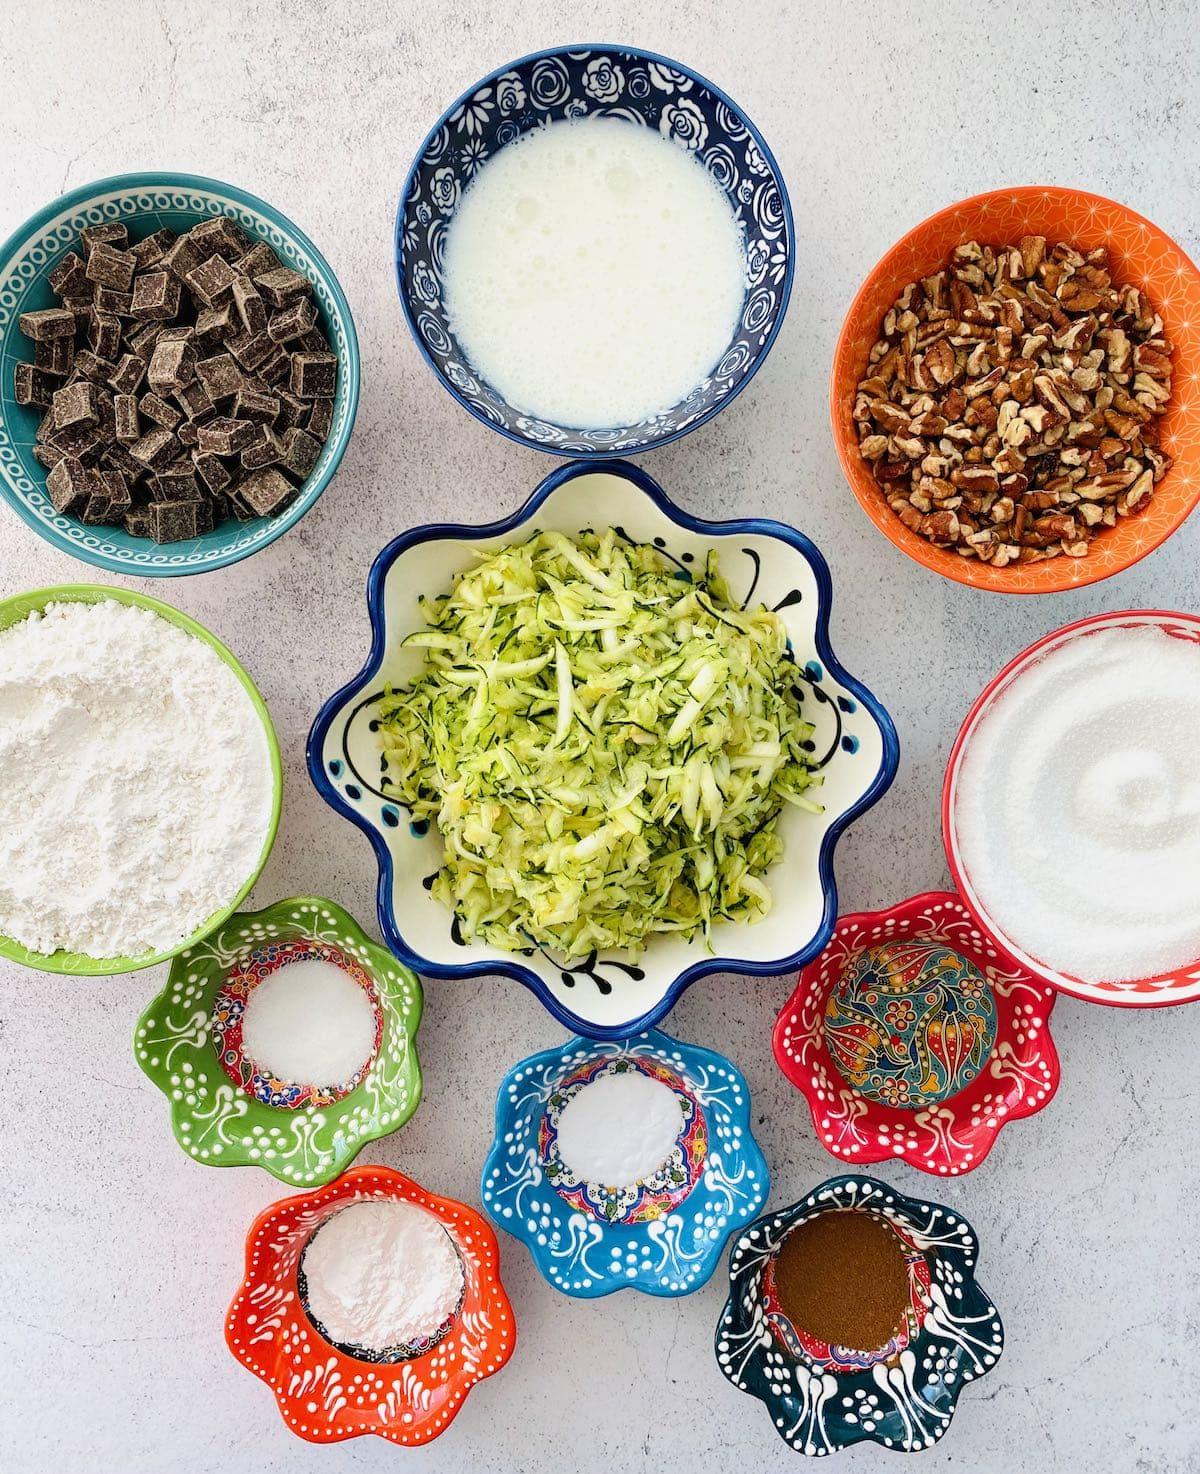 ingredients needed to make zucchini chocolate chip muffins.